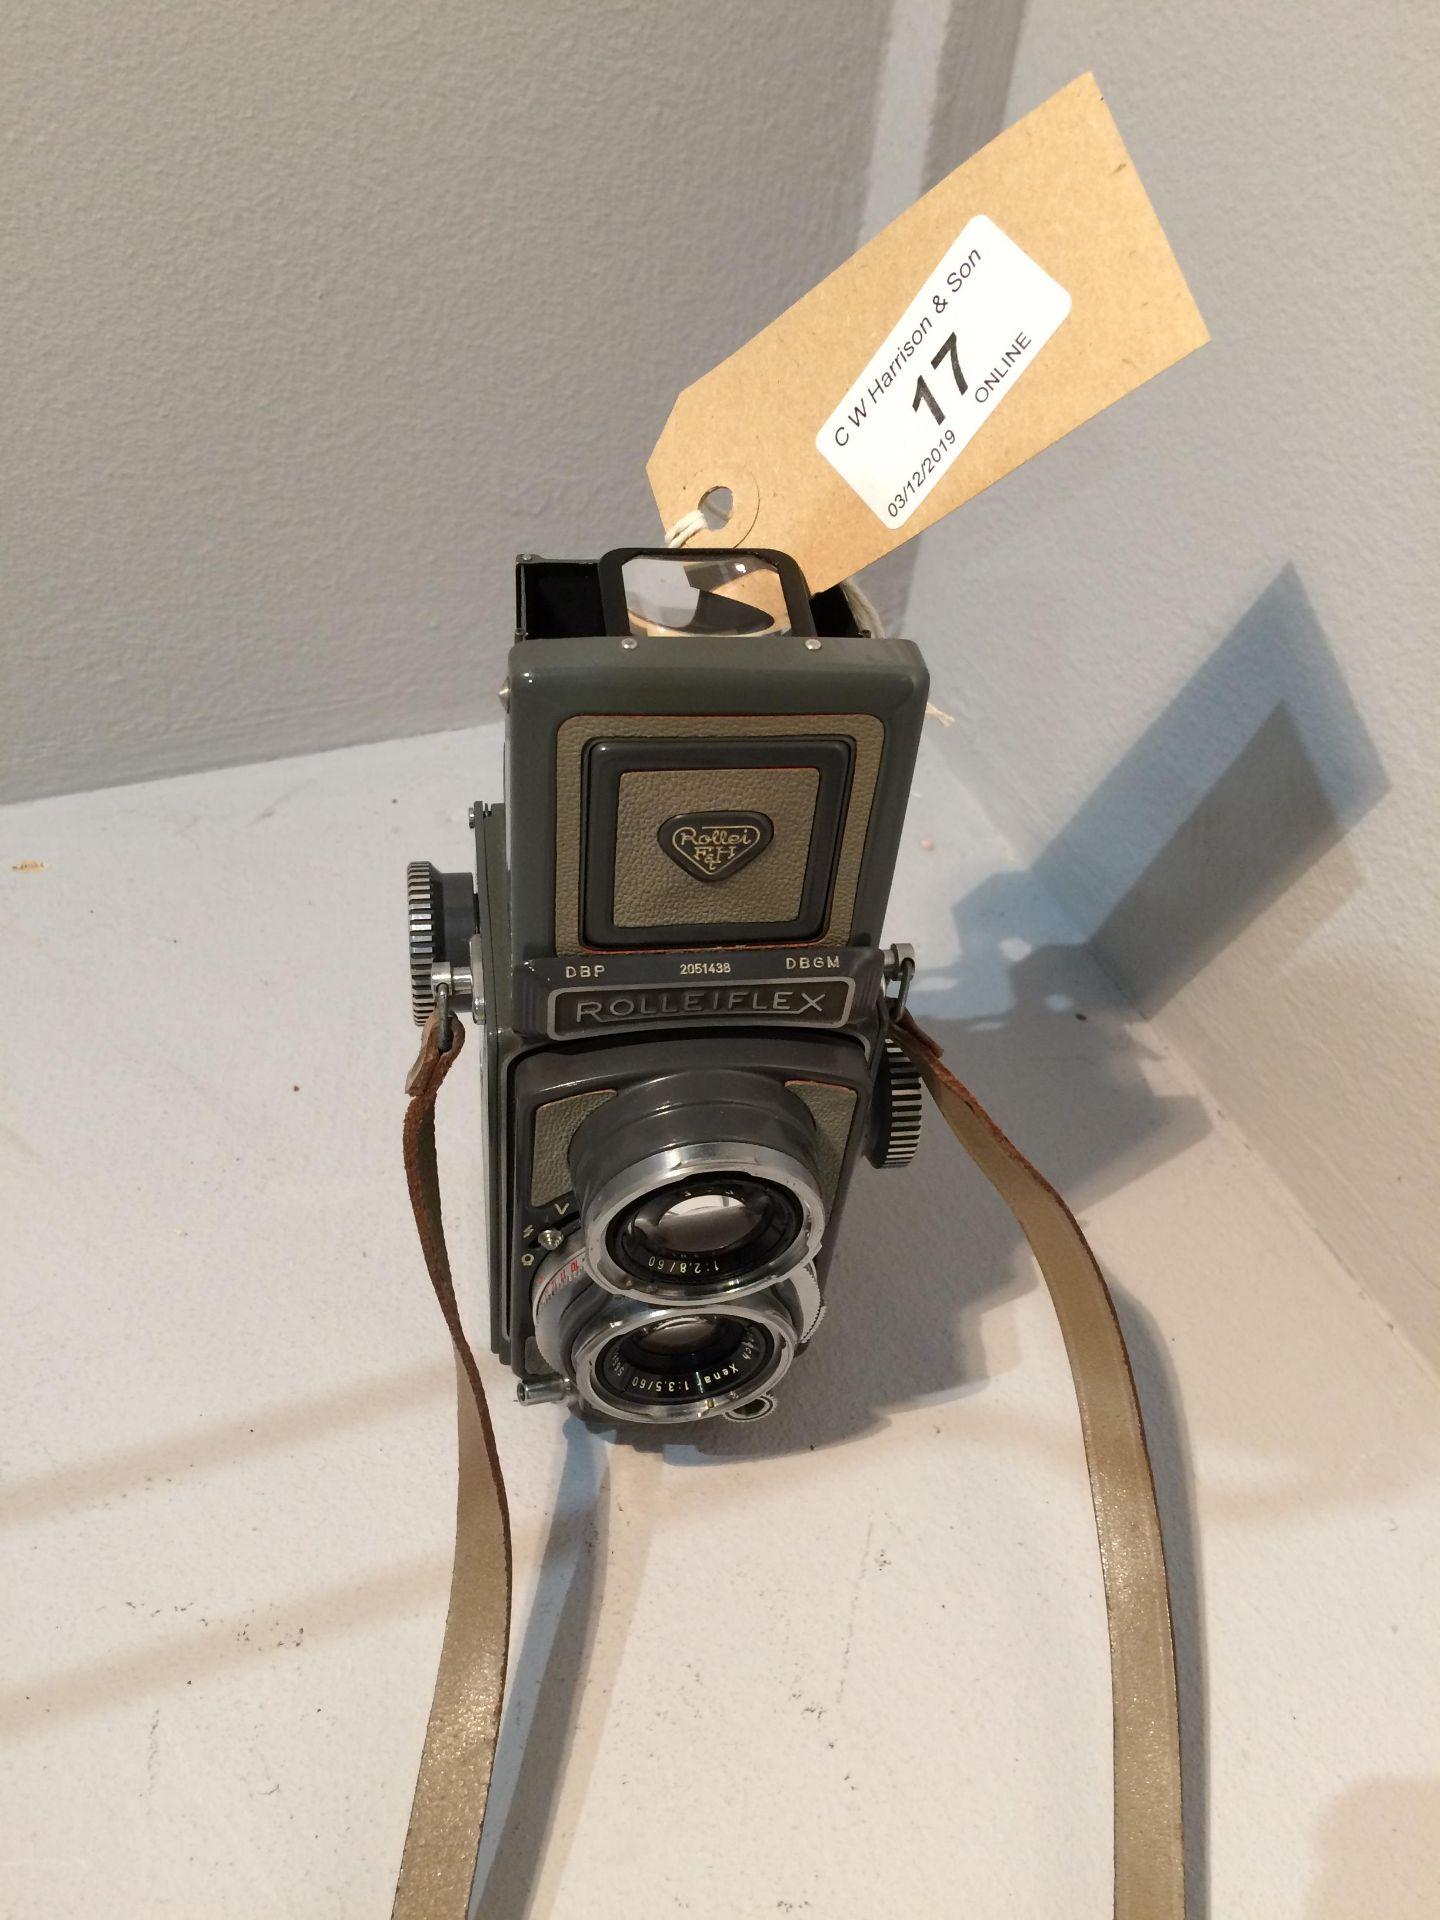 Lot 17 - Rolleiflex Franke & Heidecke 2051438 camera, Xenar 1..3.